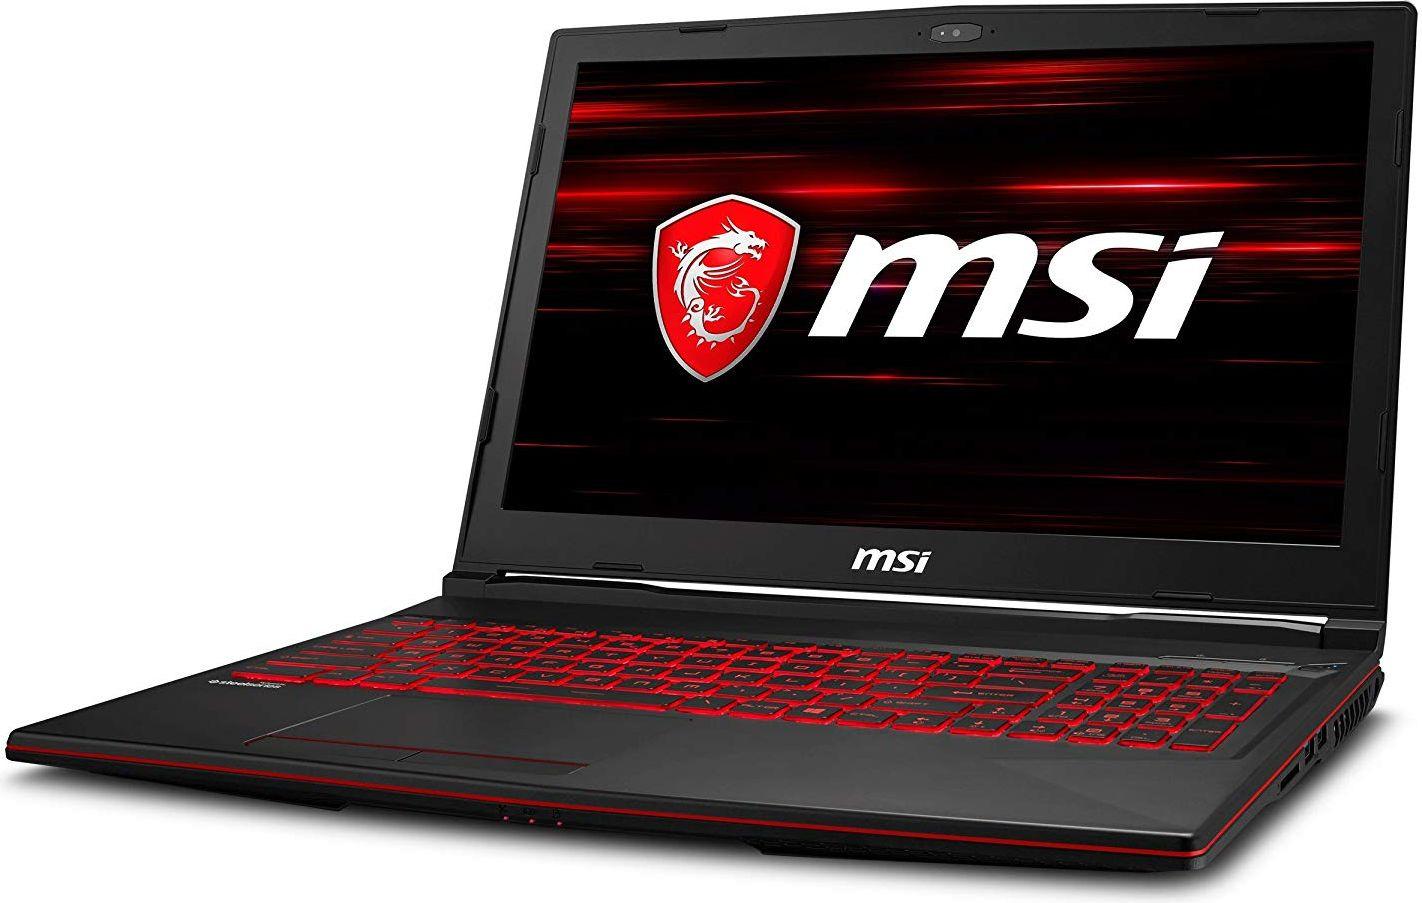 15.6 Игровой ноутбук MSI GL63 8SC 9S7-16P812-009, черный ноутбук msi gl63 8sc 017ru 9s7 16p812 017 i5 8300h 2 3 8gb 1tb 128gb ssd 15 6 fhd ips geforce gtx1650 4gb win10 home black